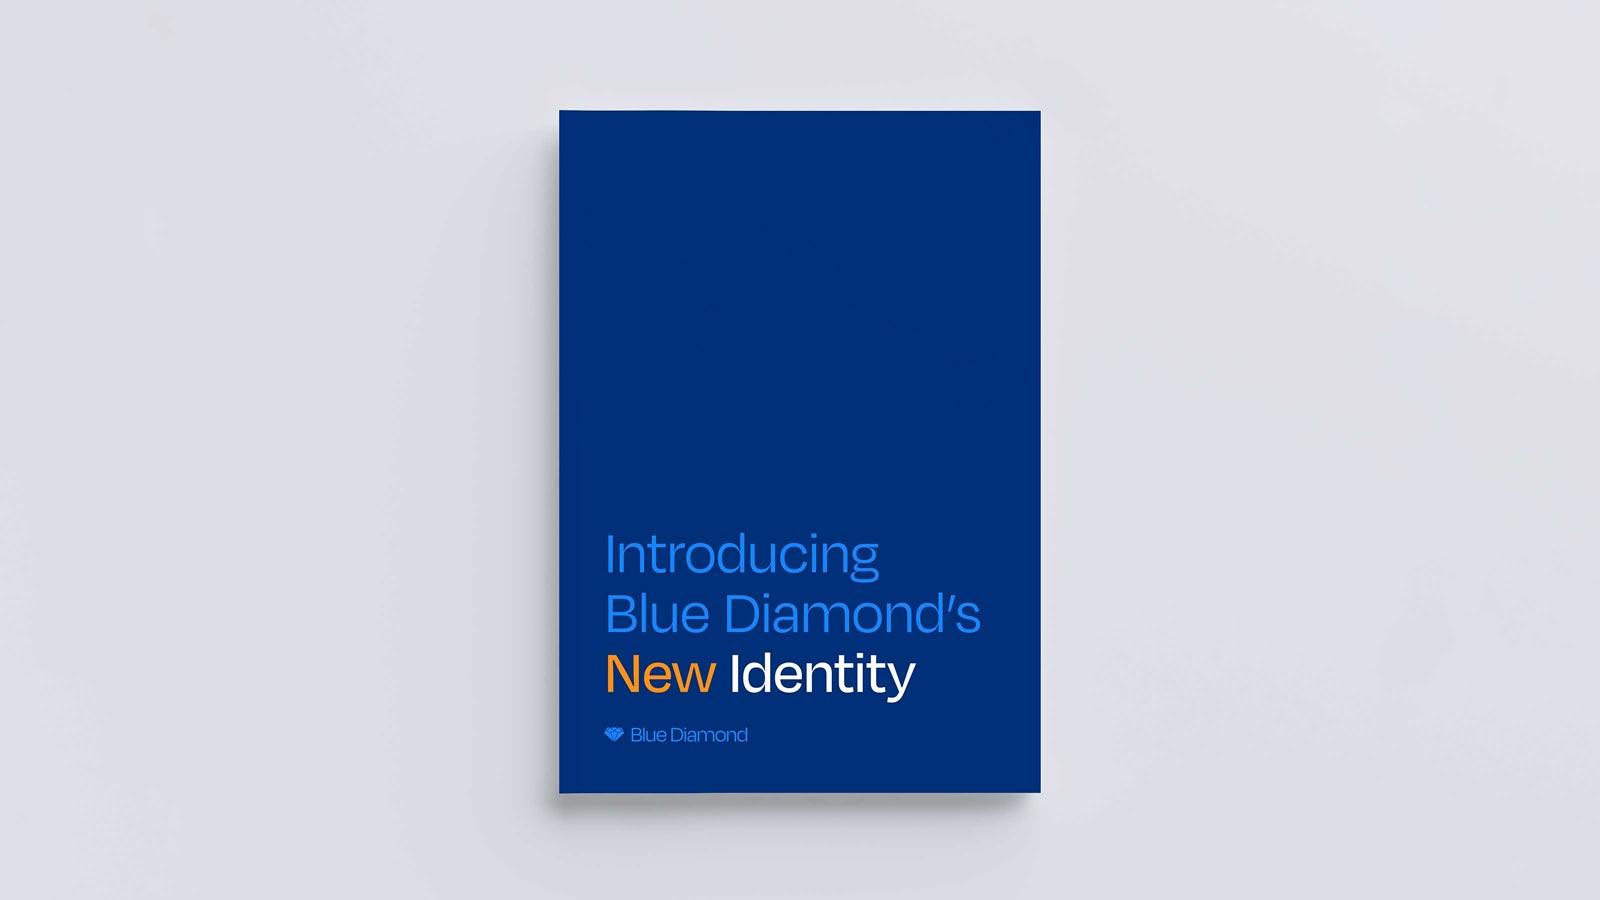 Blue Diamond blue book cover